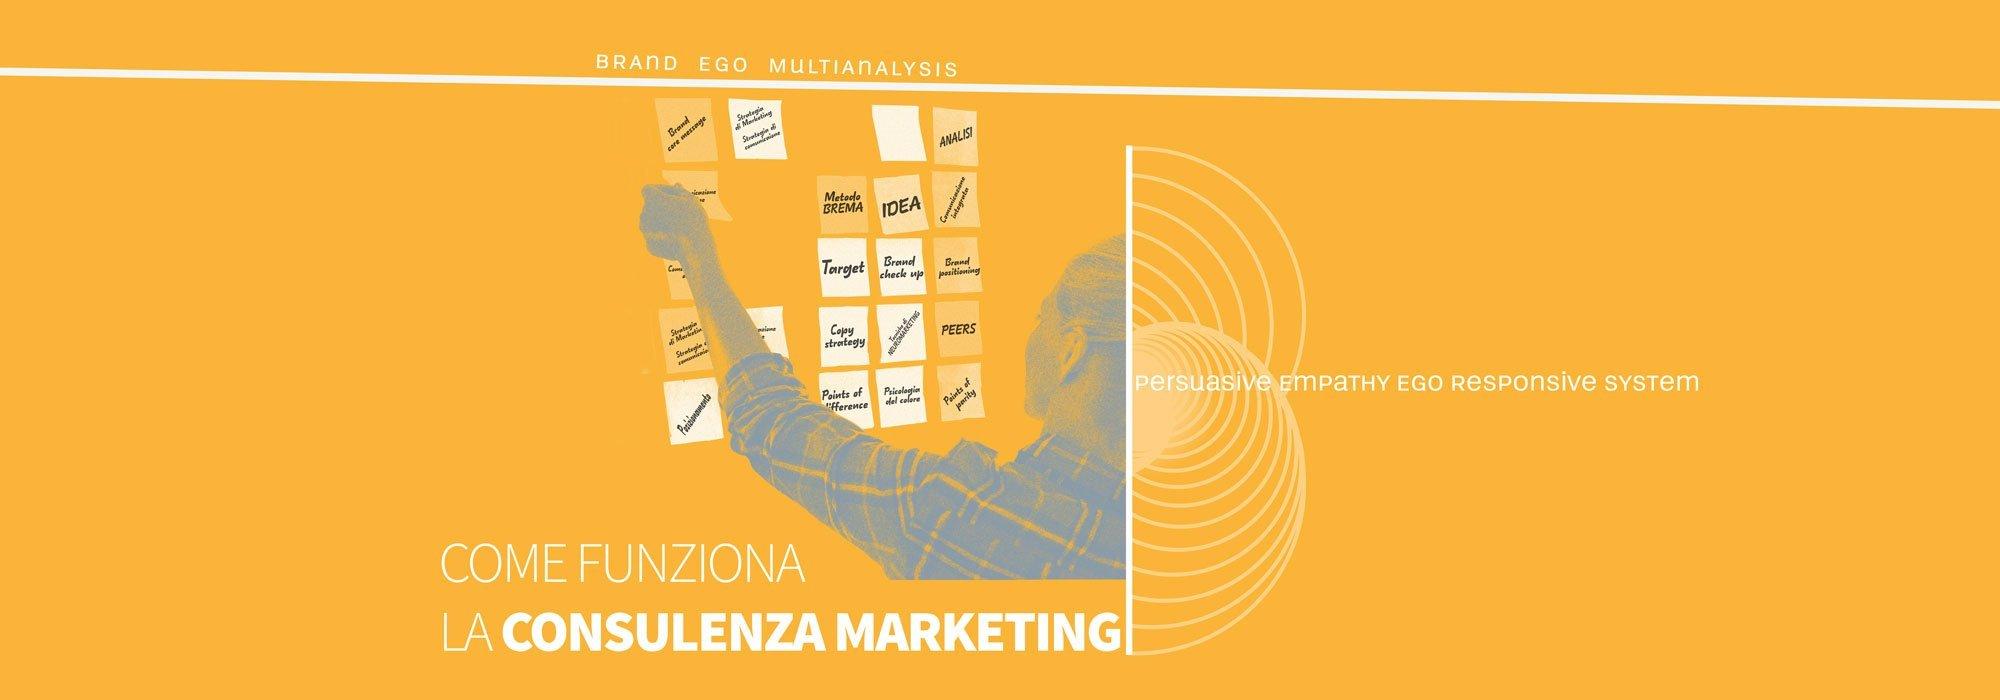 Agenzia di comunicazione EGO NewCom: come funziona una consulenza marketing